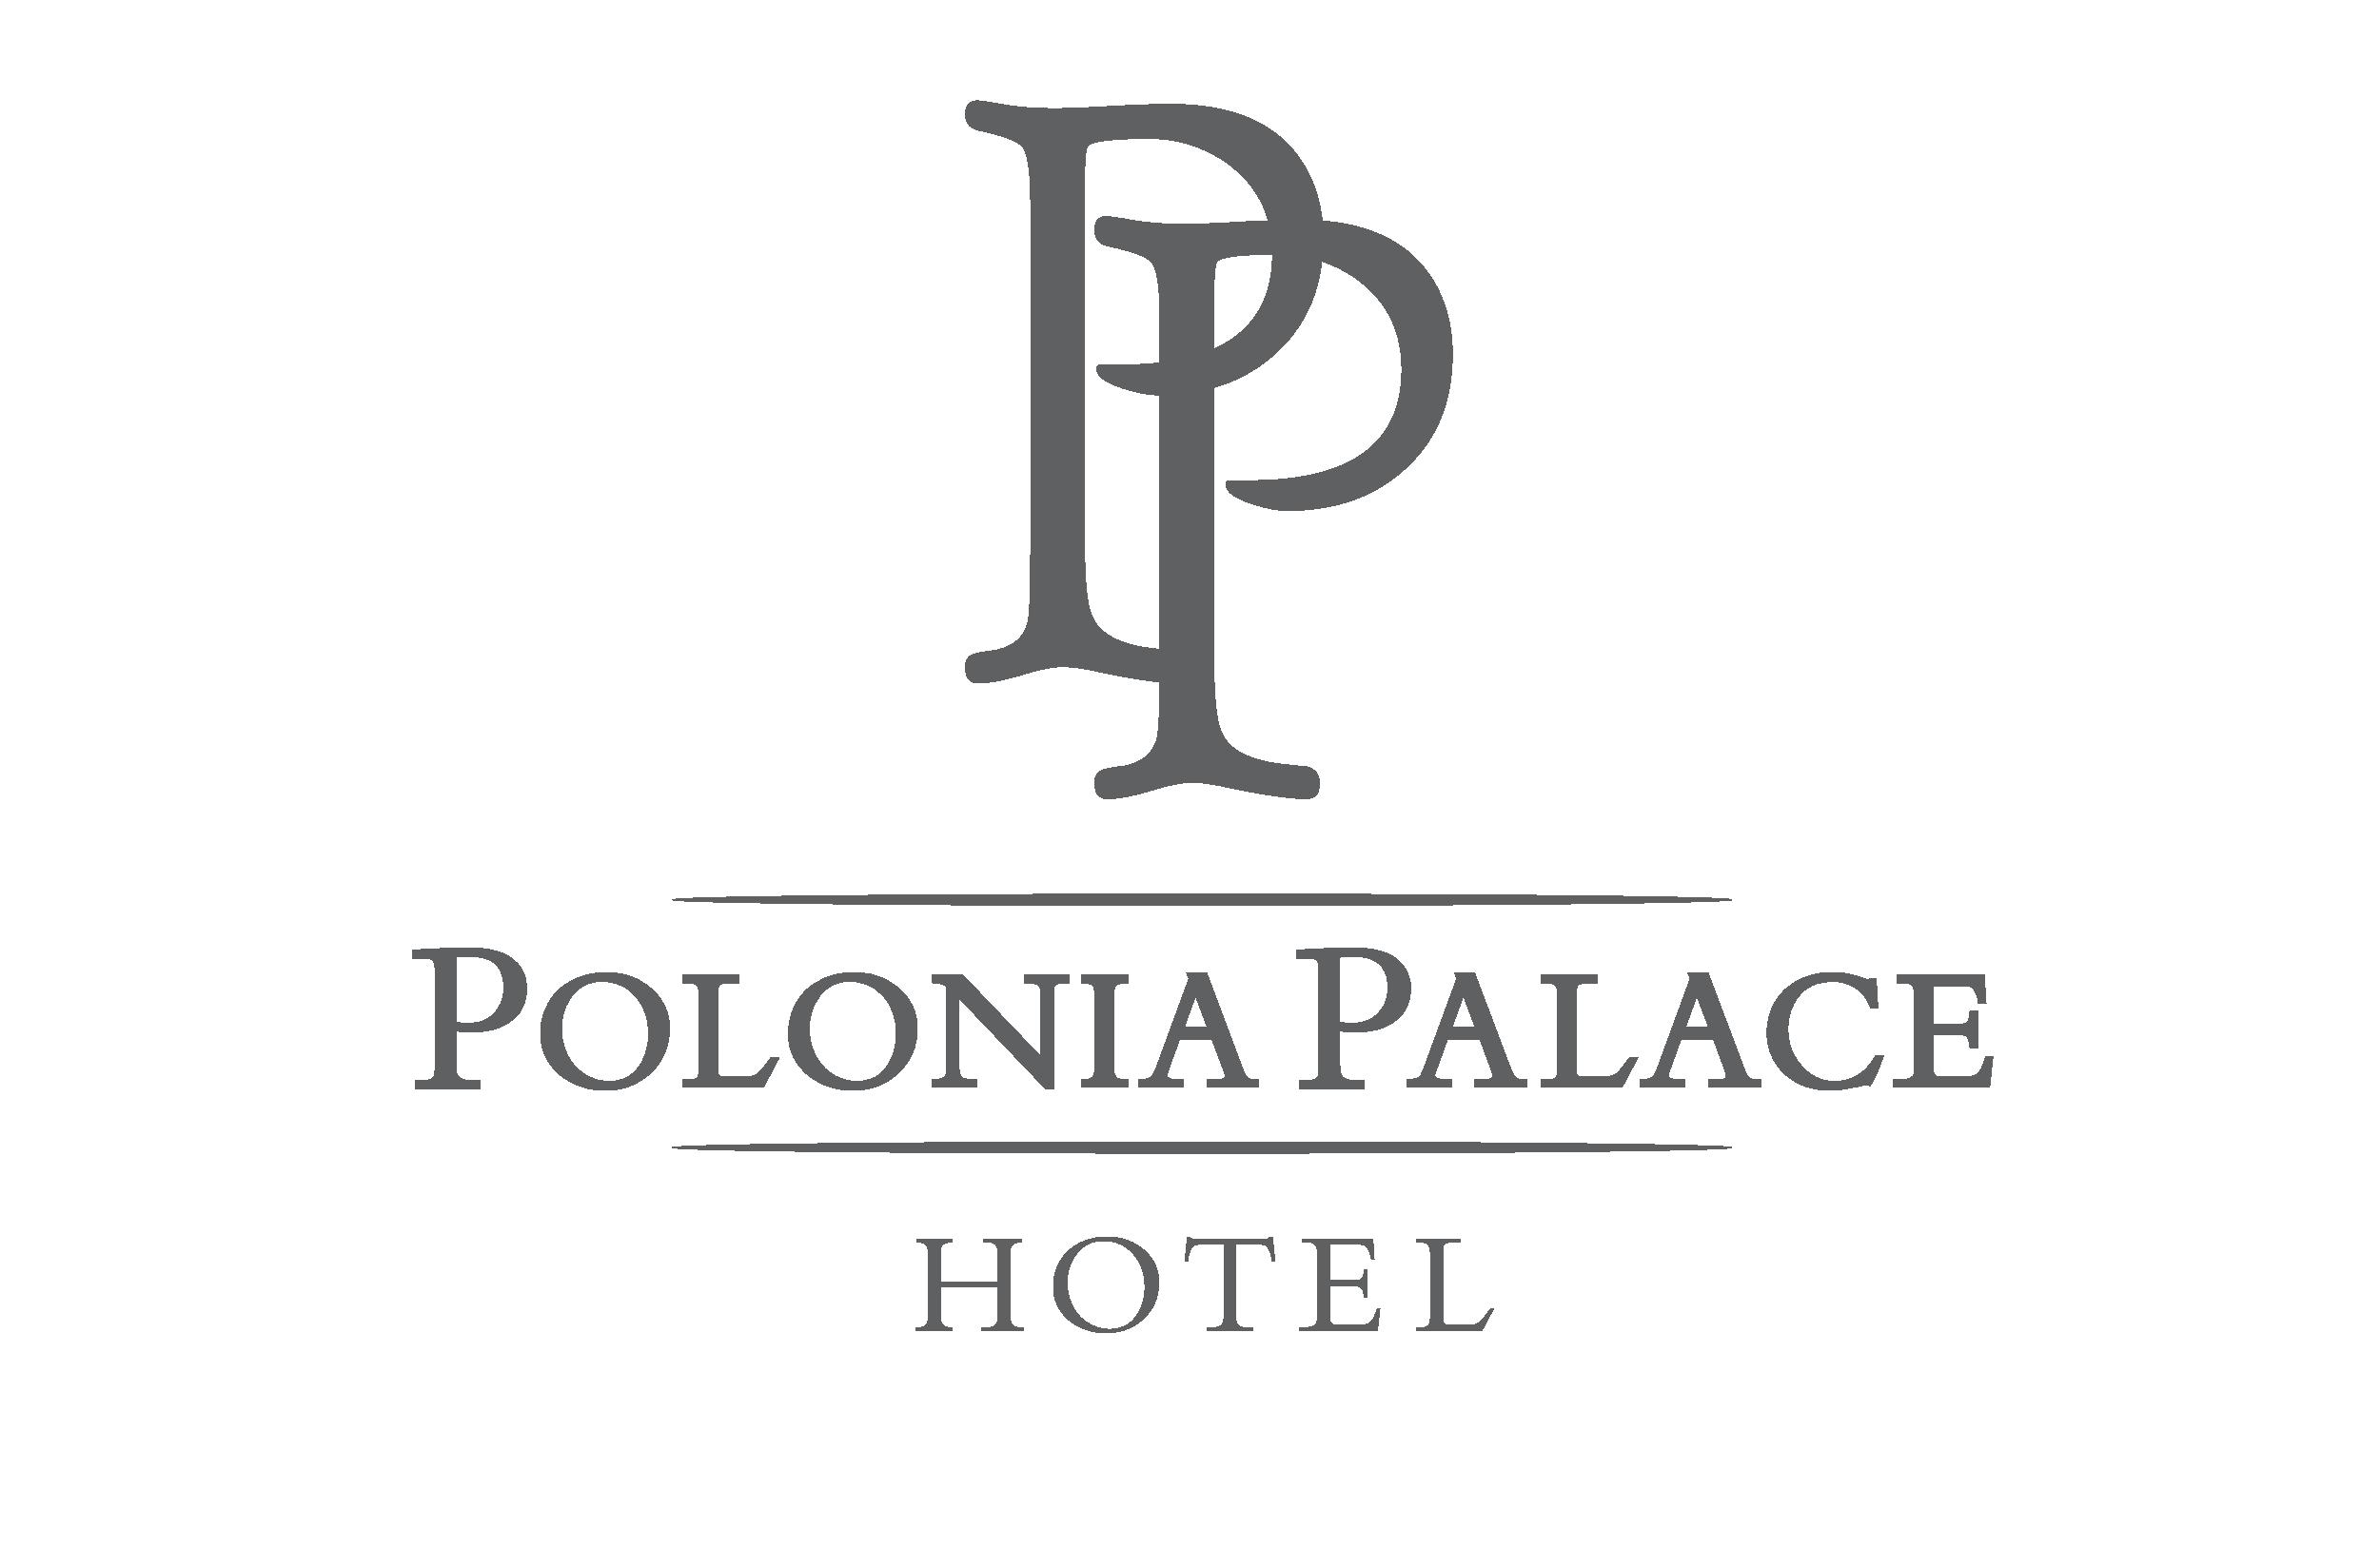 PoloniaPalace